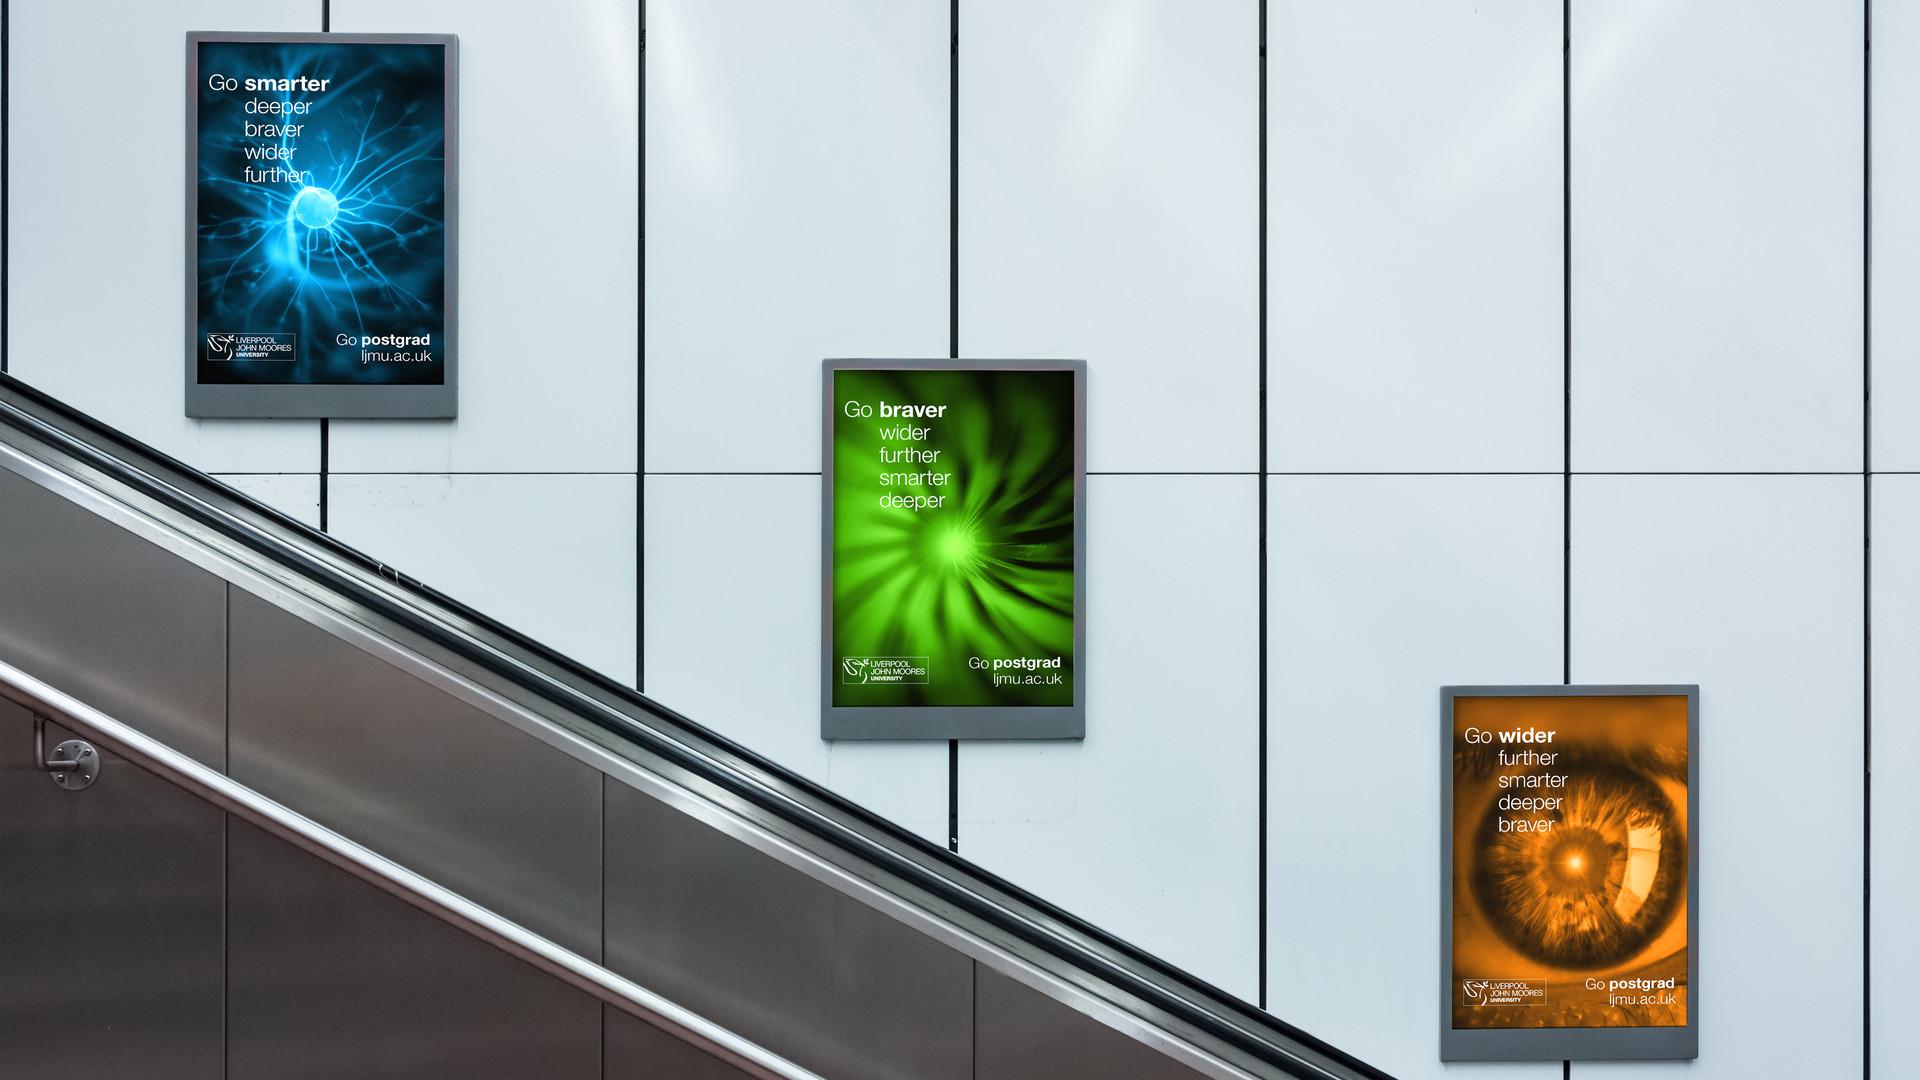 4K 3 posters escalator.jpg